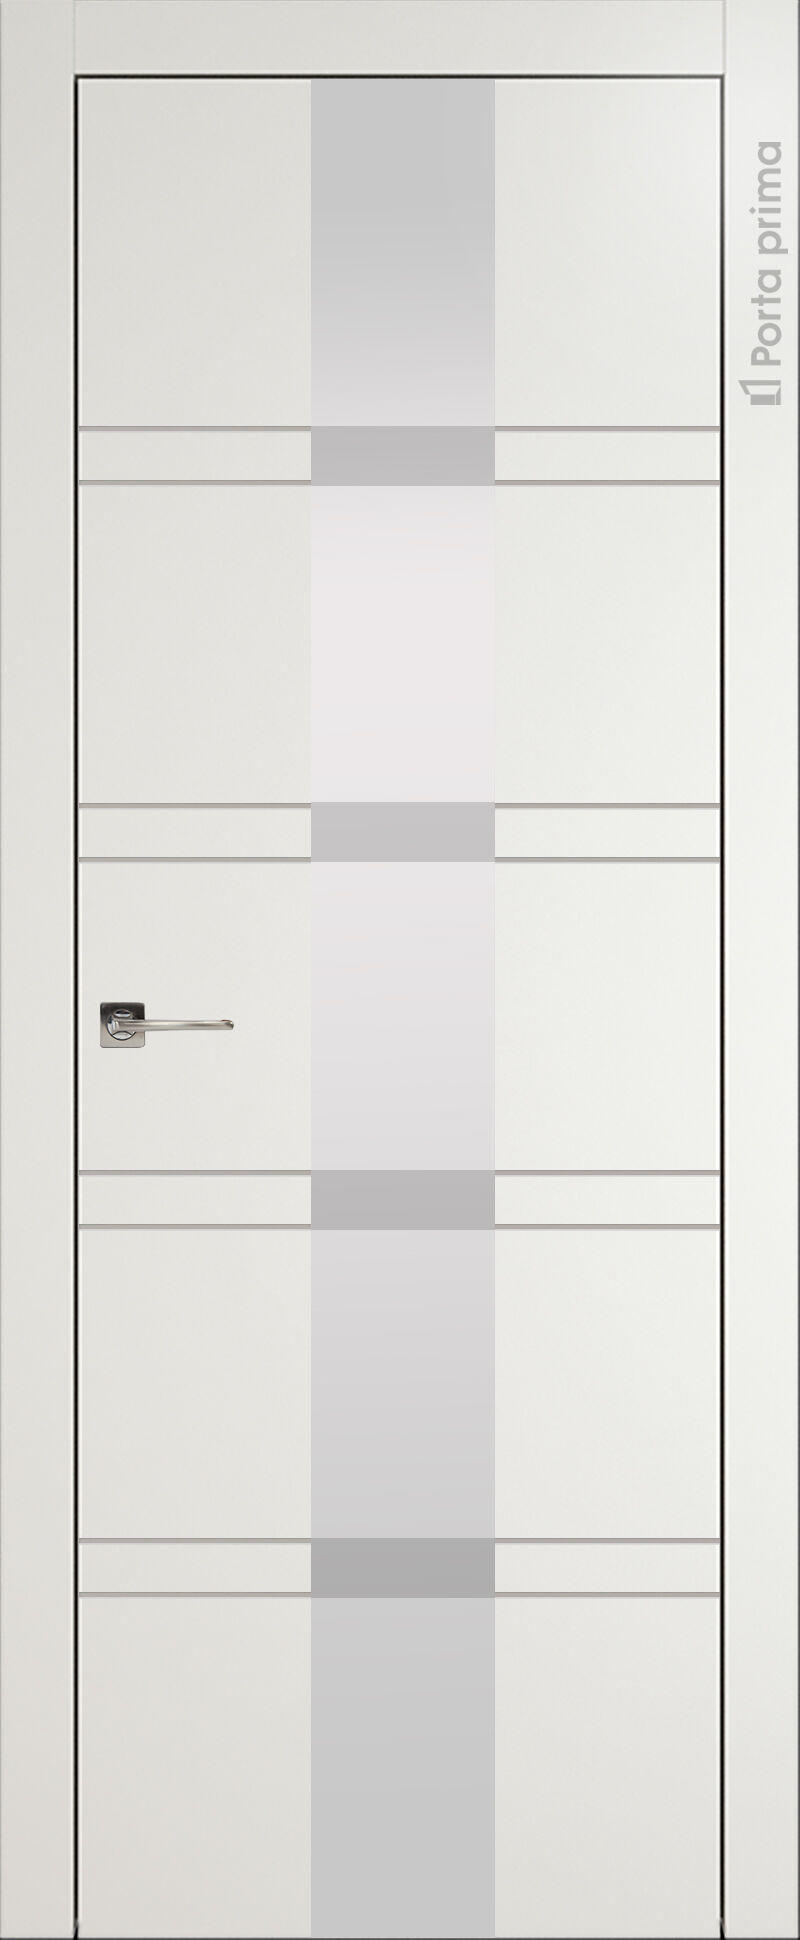 Tivoli Ж-4 цвет - Бежевая эмаль (RAL 9010) Со стеклом (ДО)